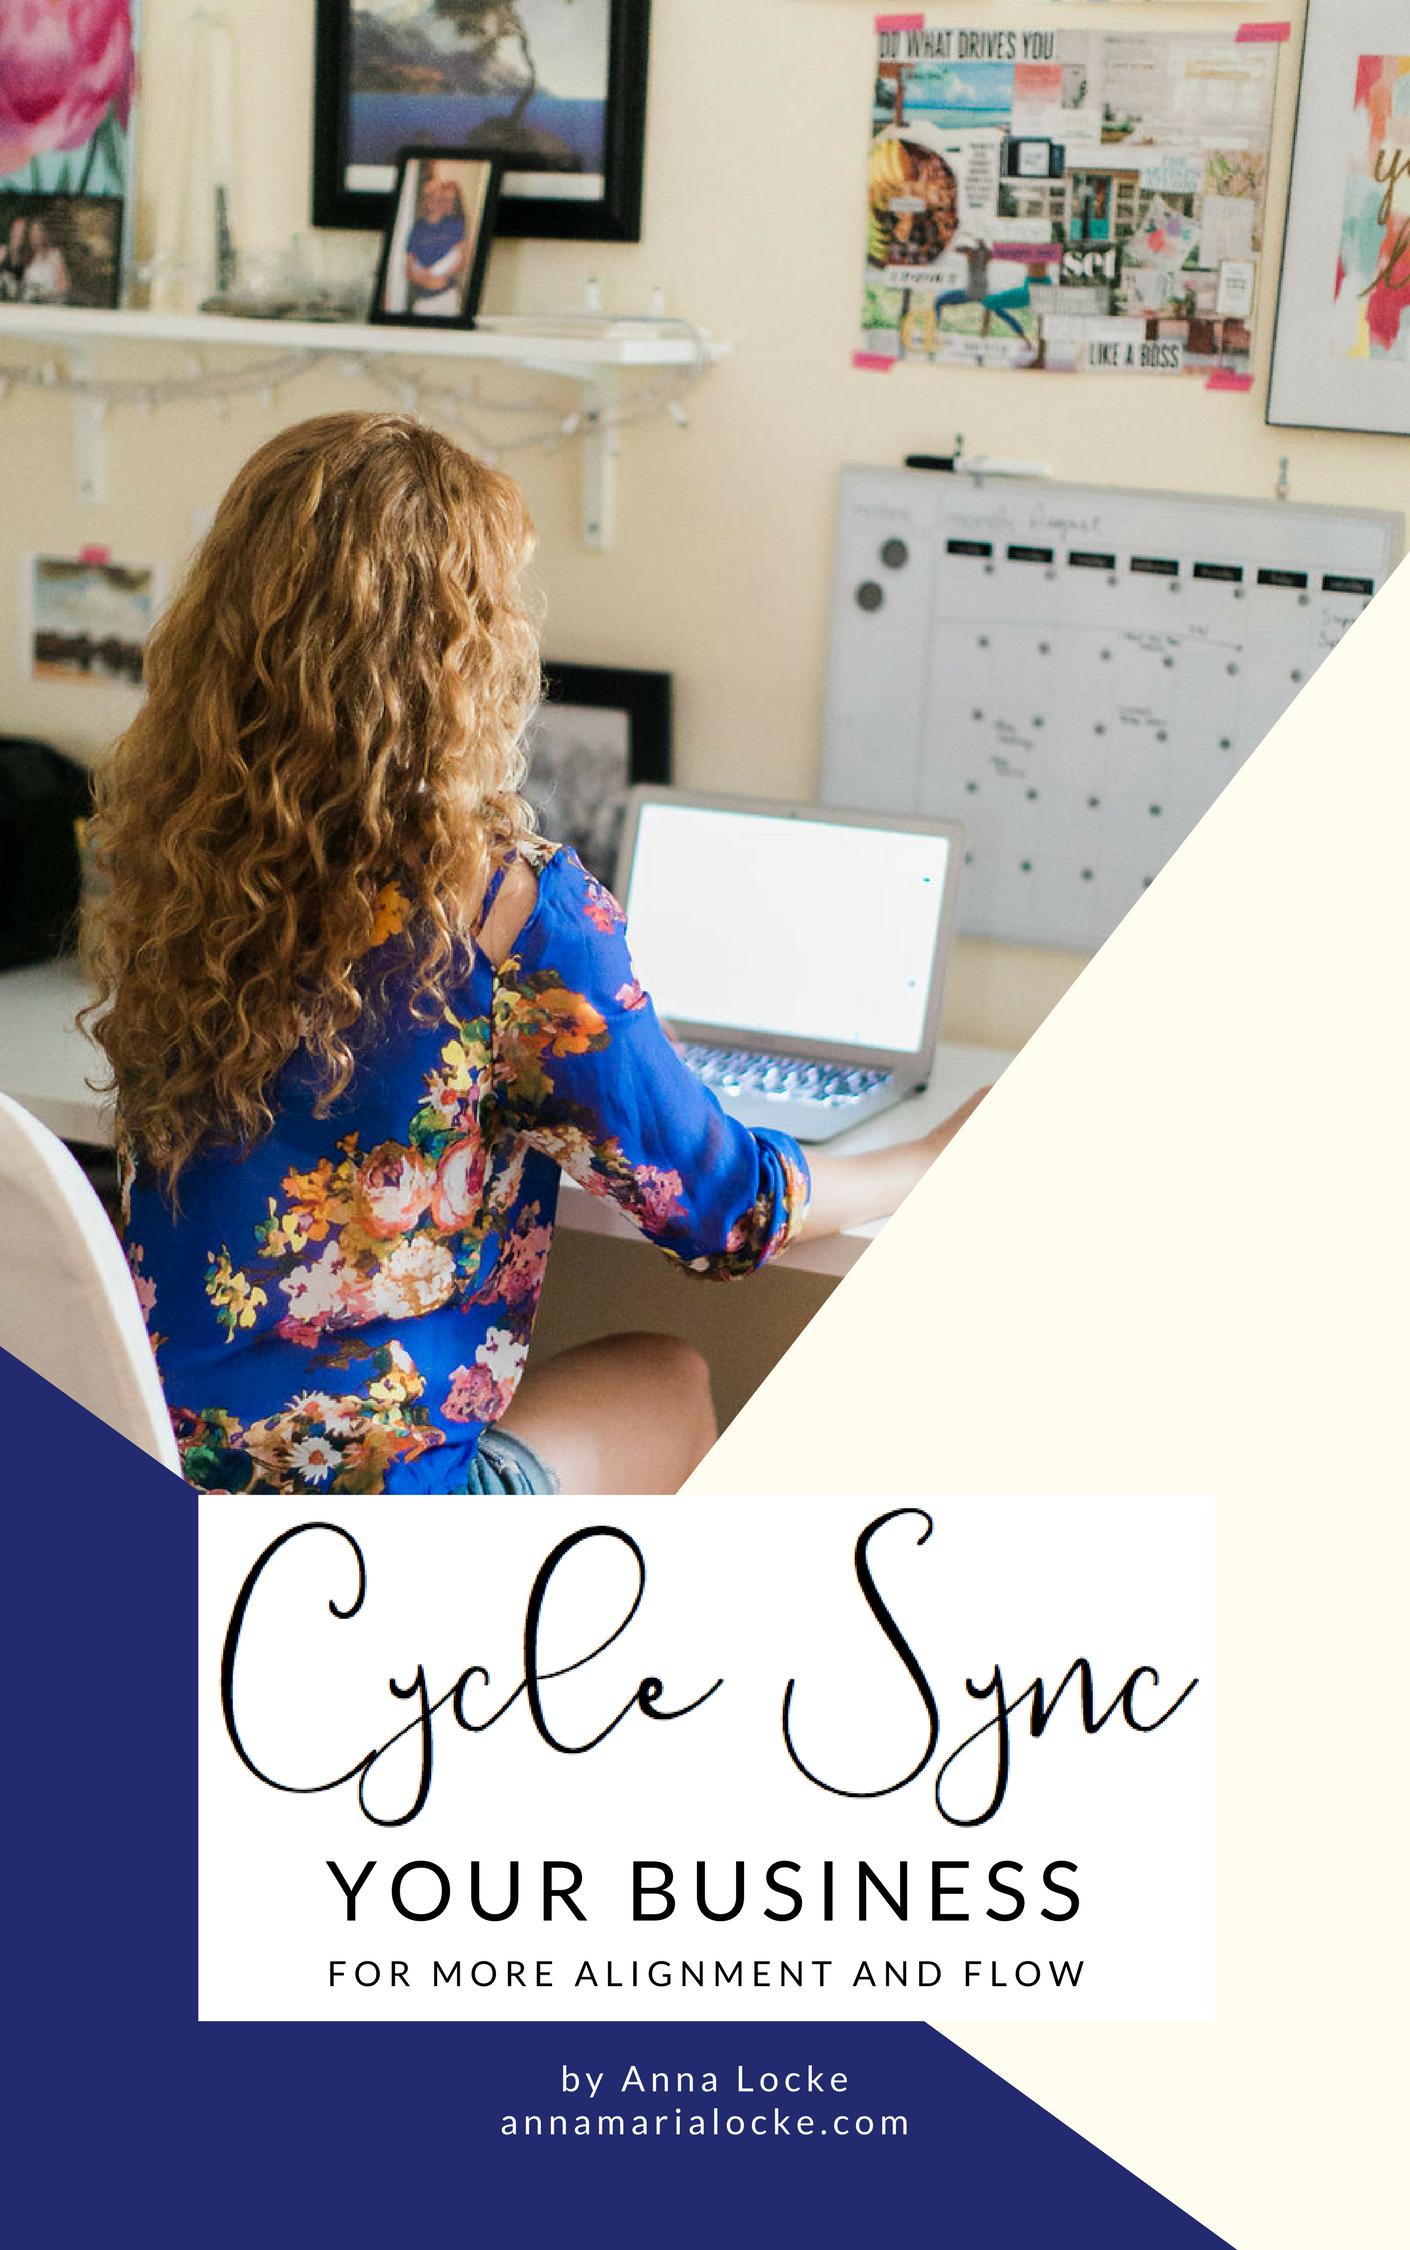 cycle sync your biz ebook